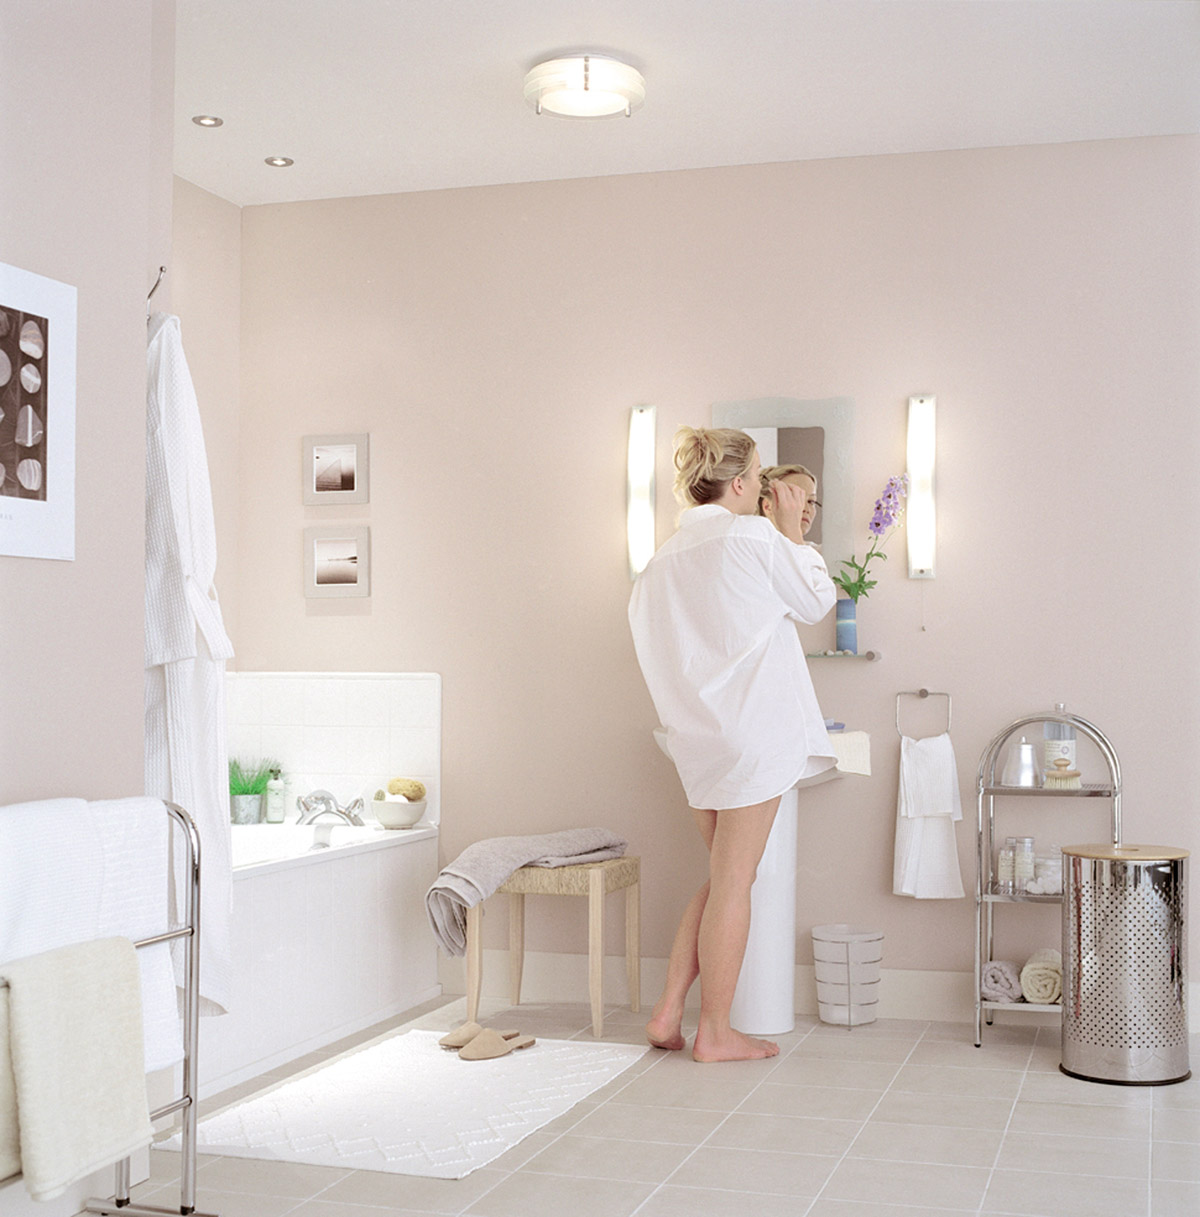 Vreme je za promene funkcionalno kupatilo bravacasa - Lichtplanung badezimmer ...